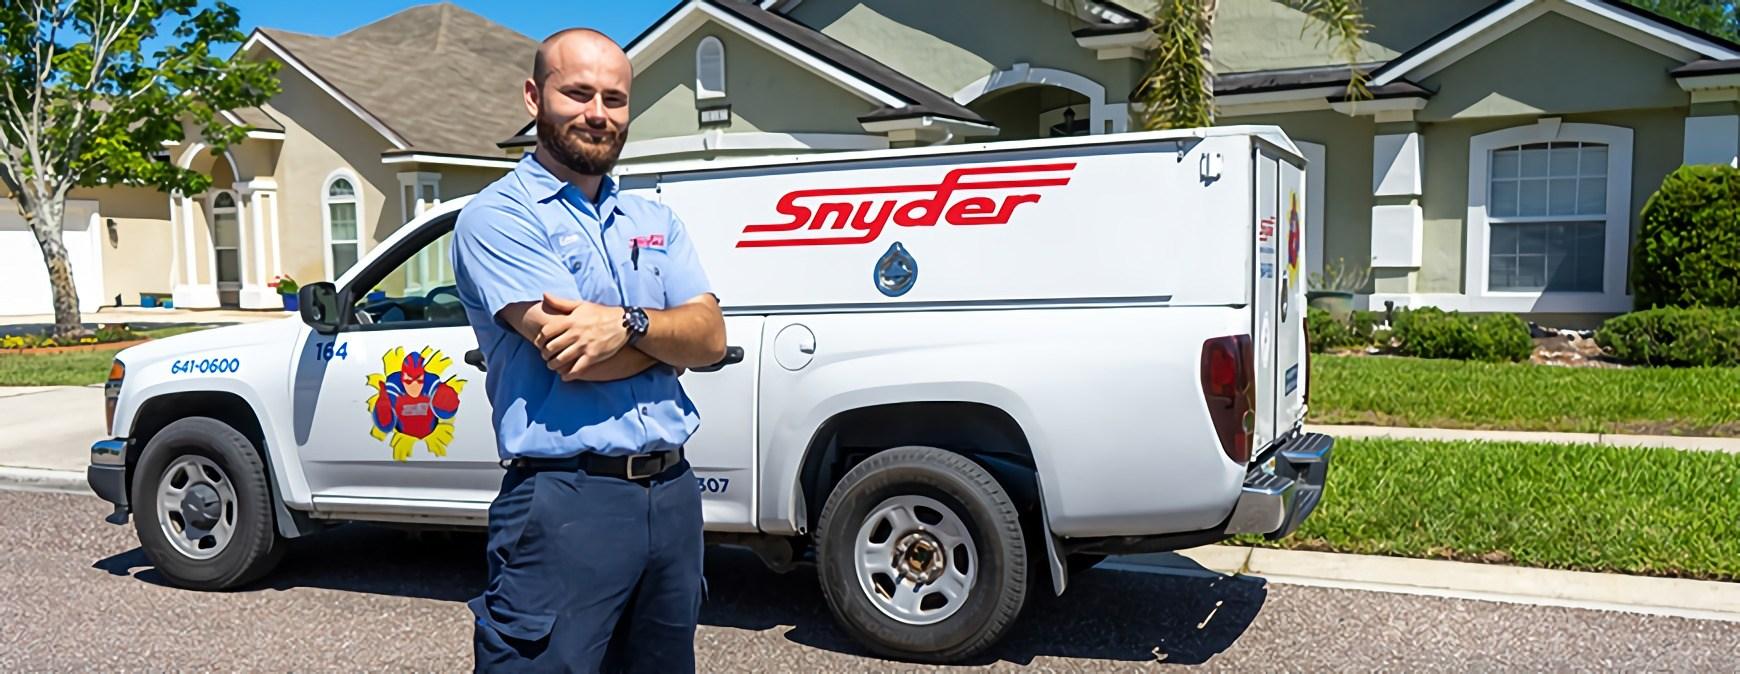 hvac technician in front of work truck